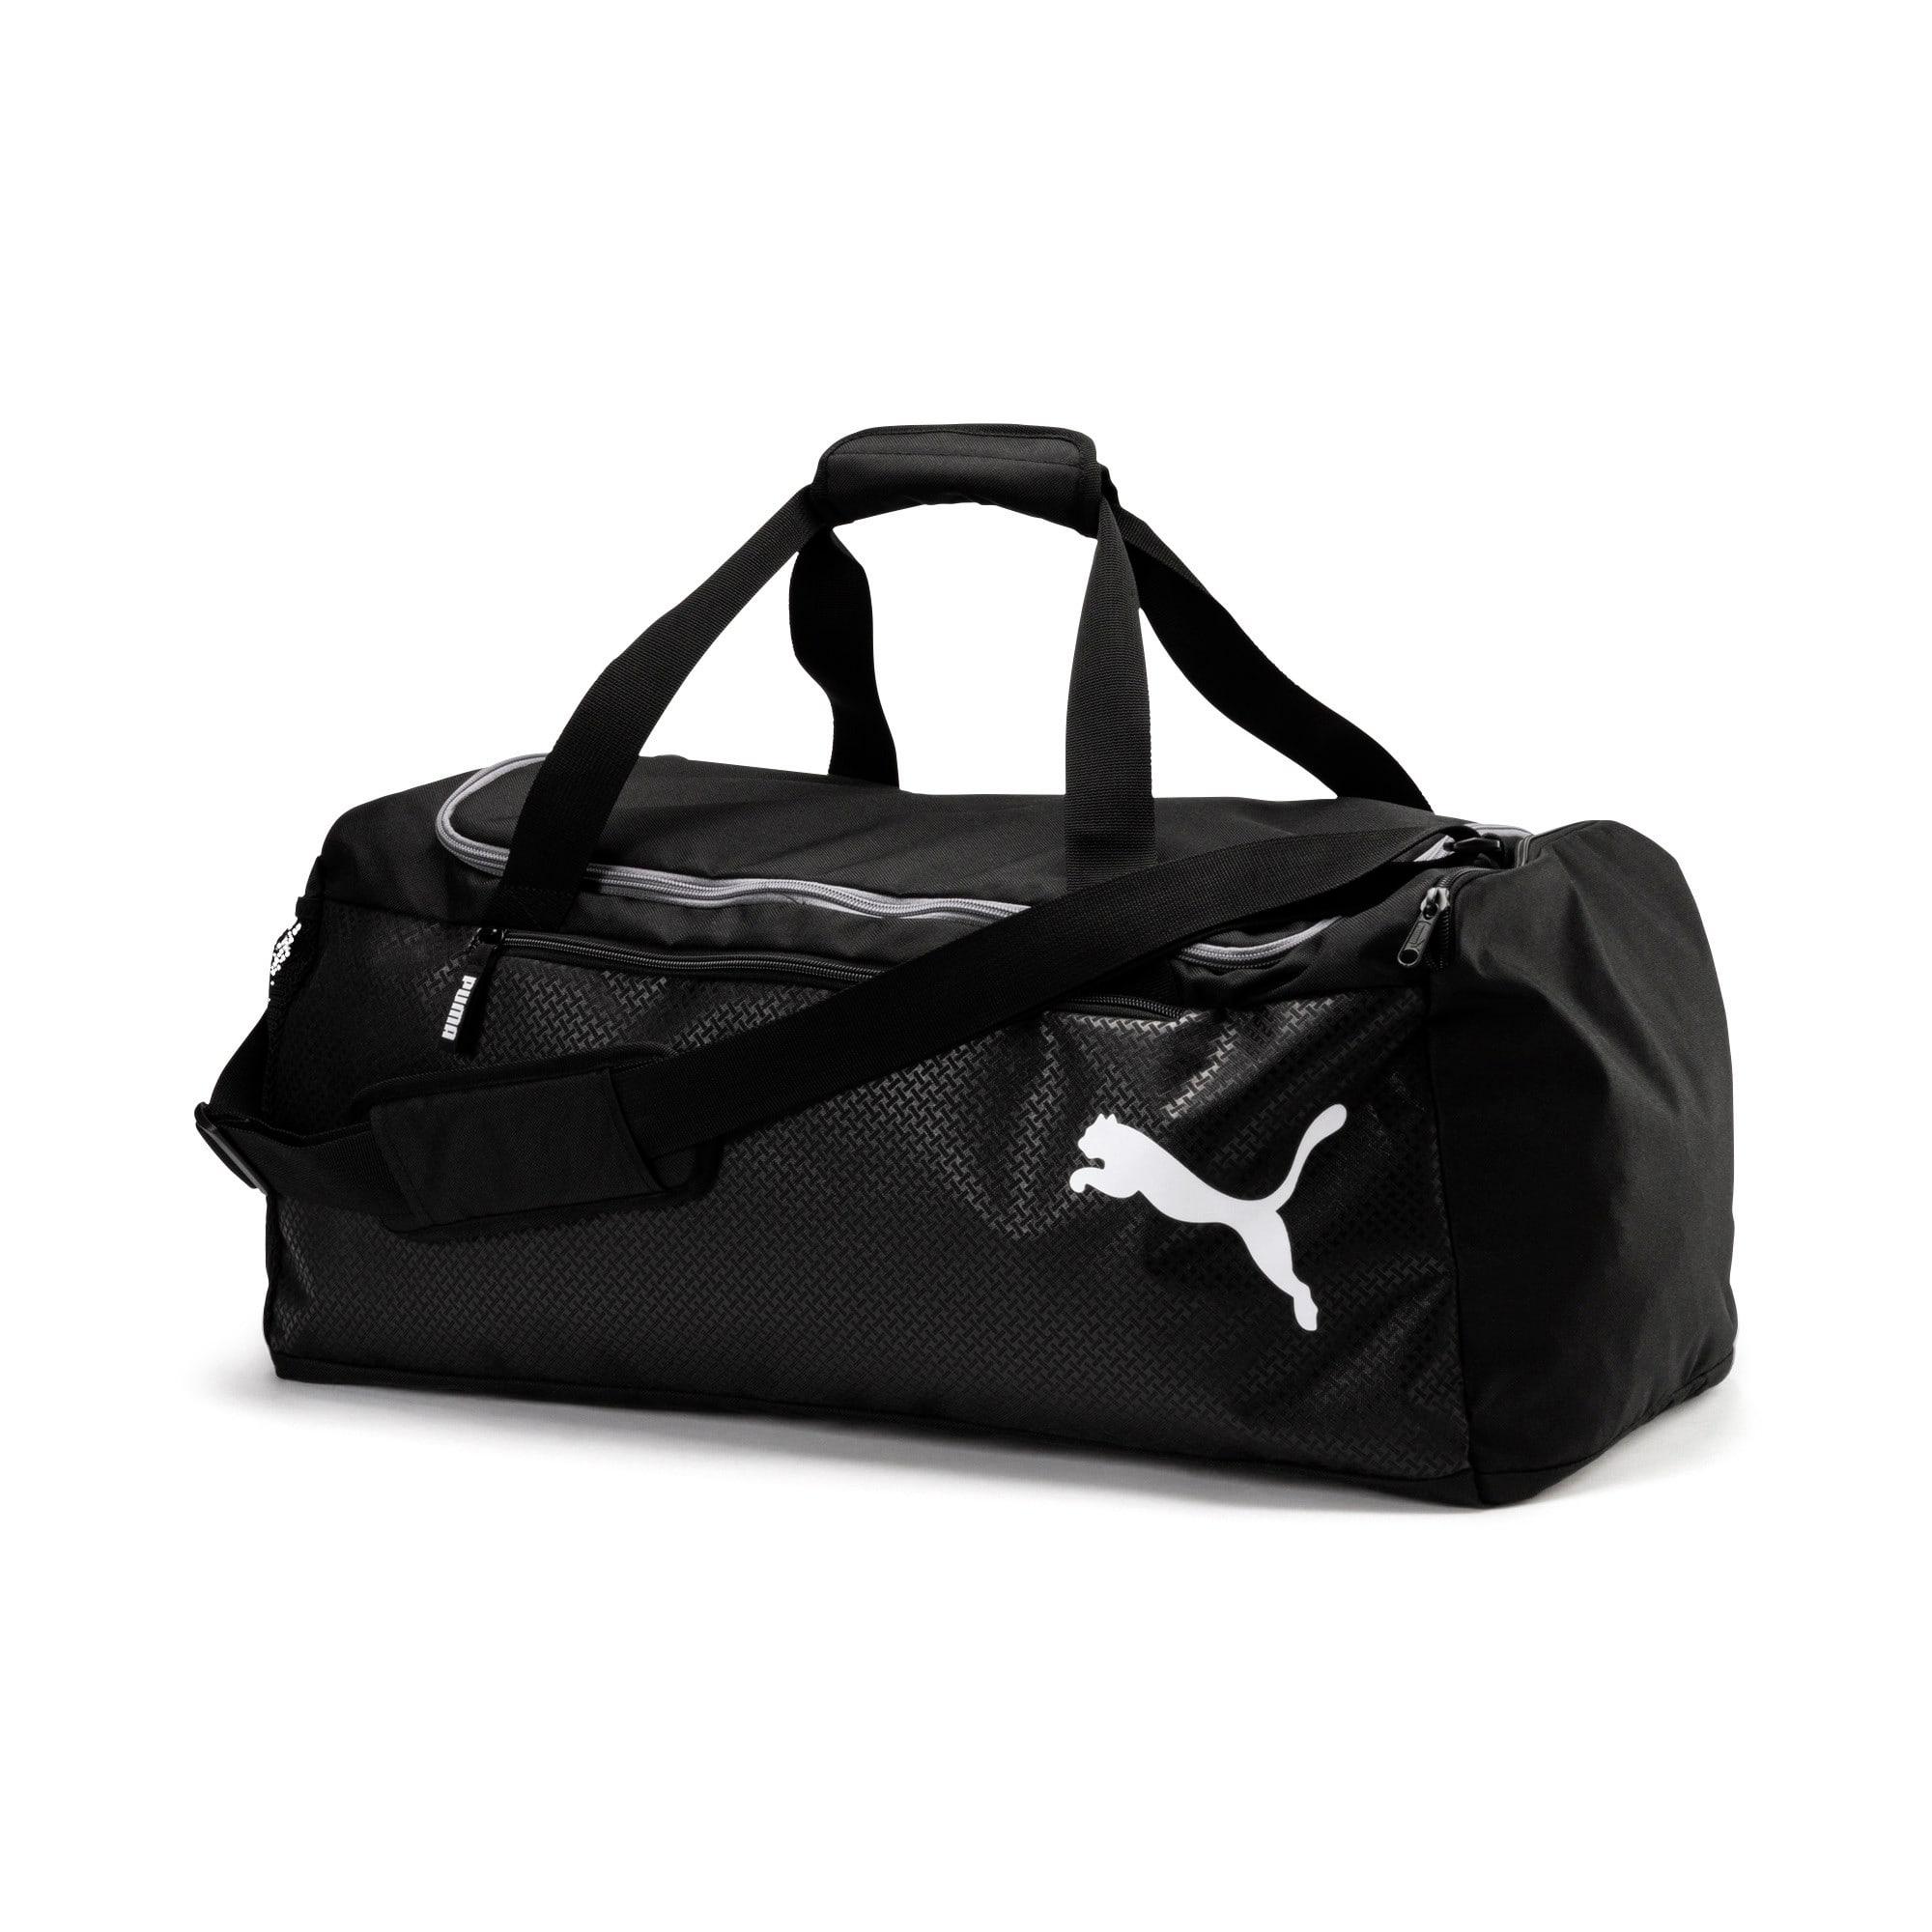 Thumbnail 1 of Fundamentals Medium Sports Bag, Puma Black, medium